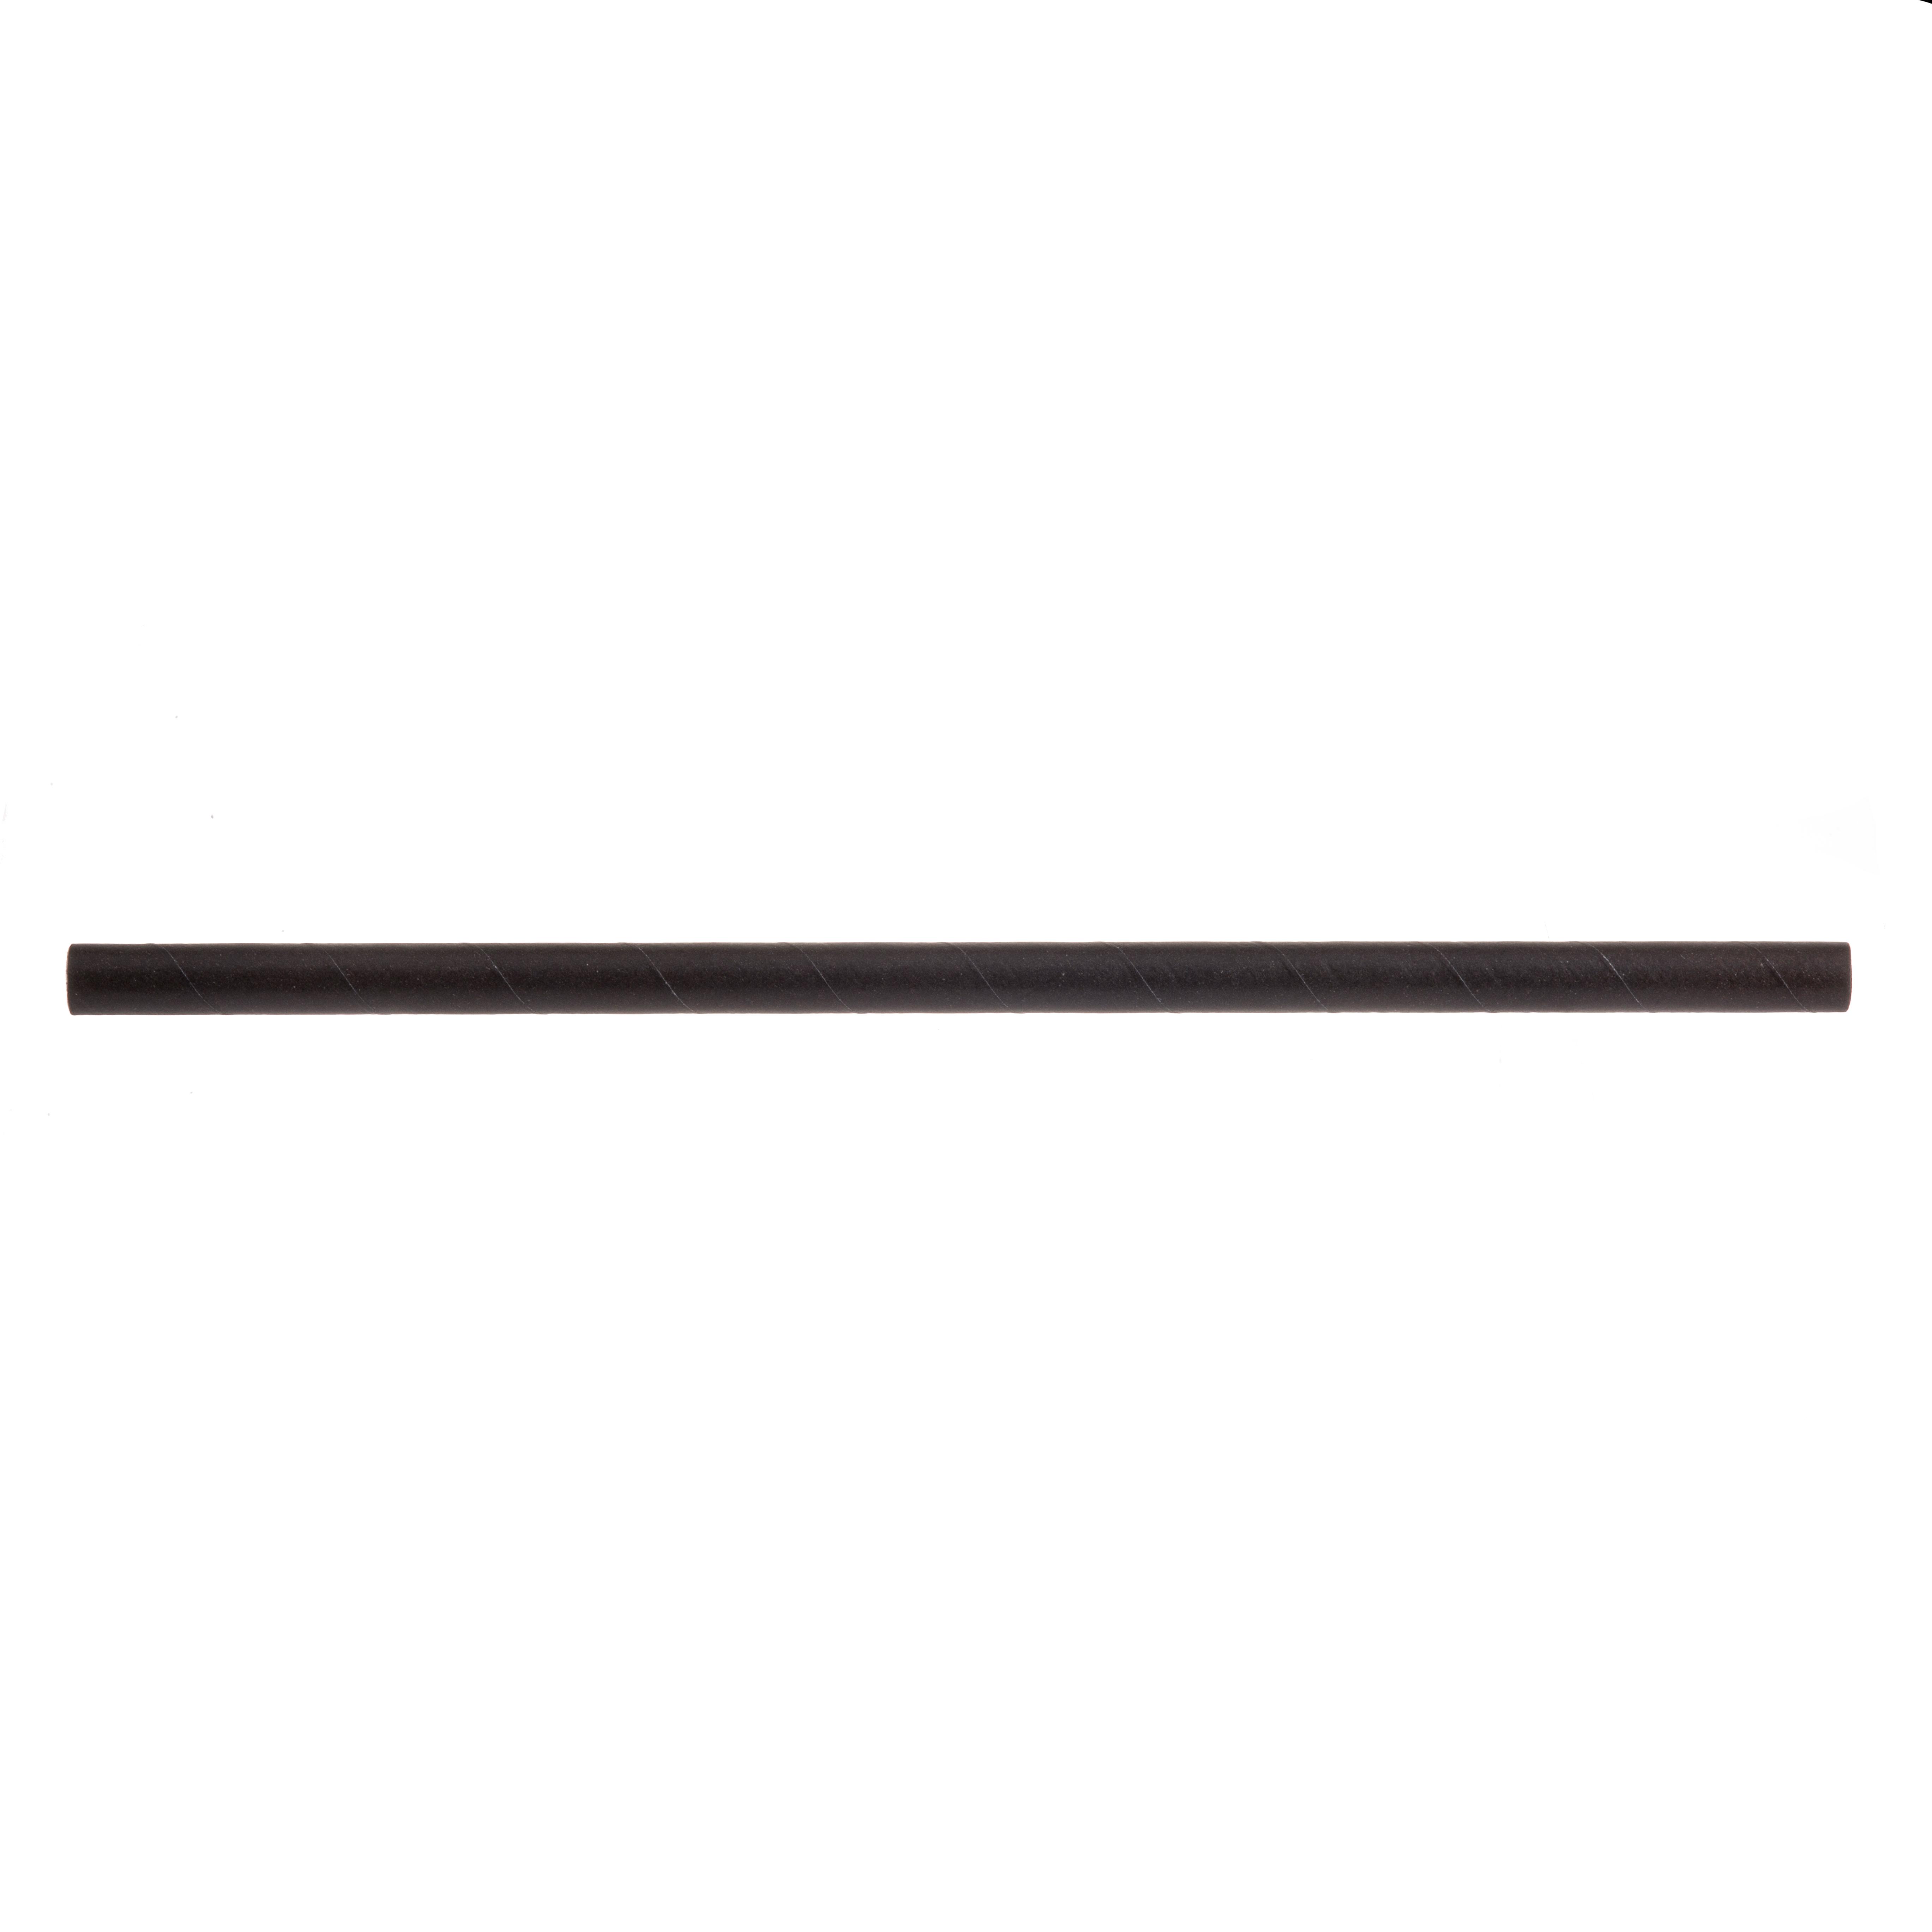 TableCraft Products 700108 straws